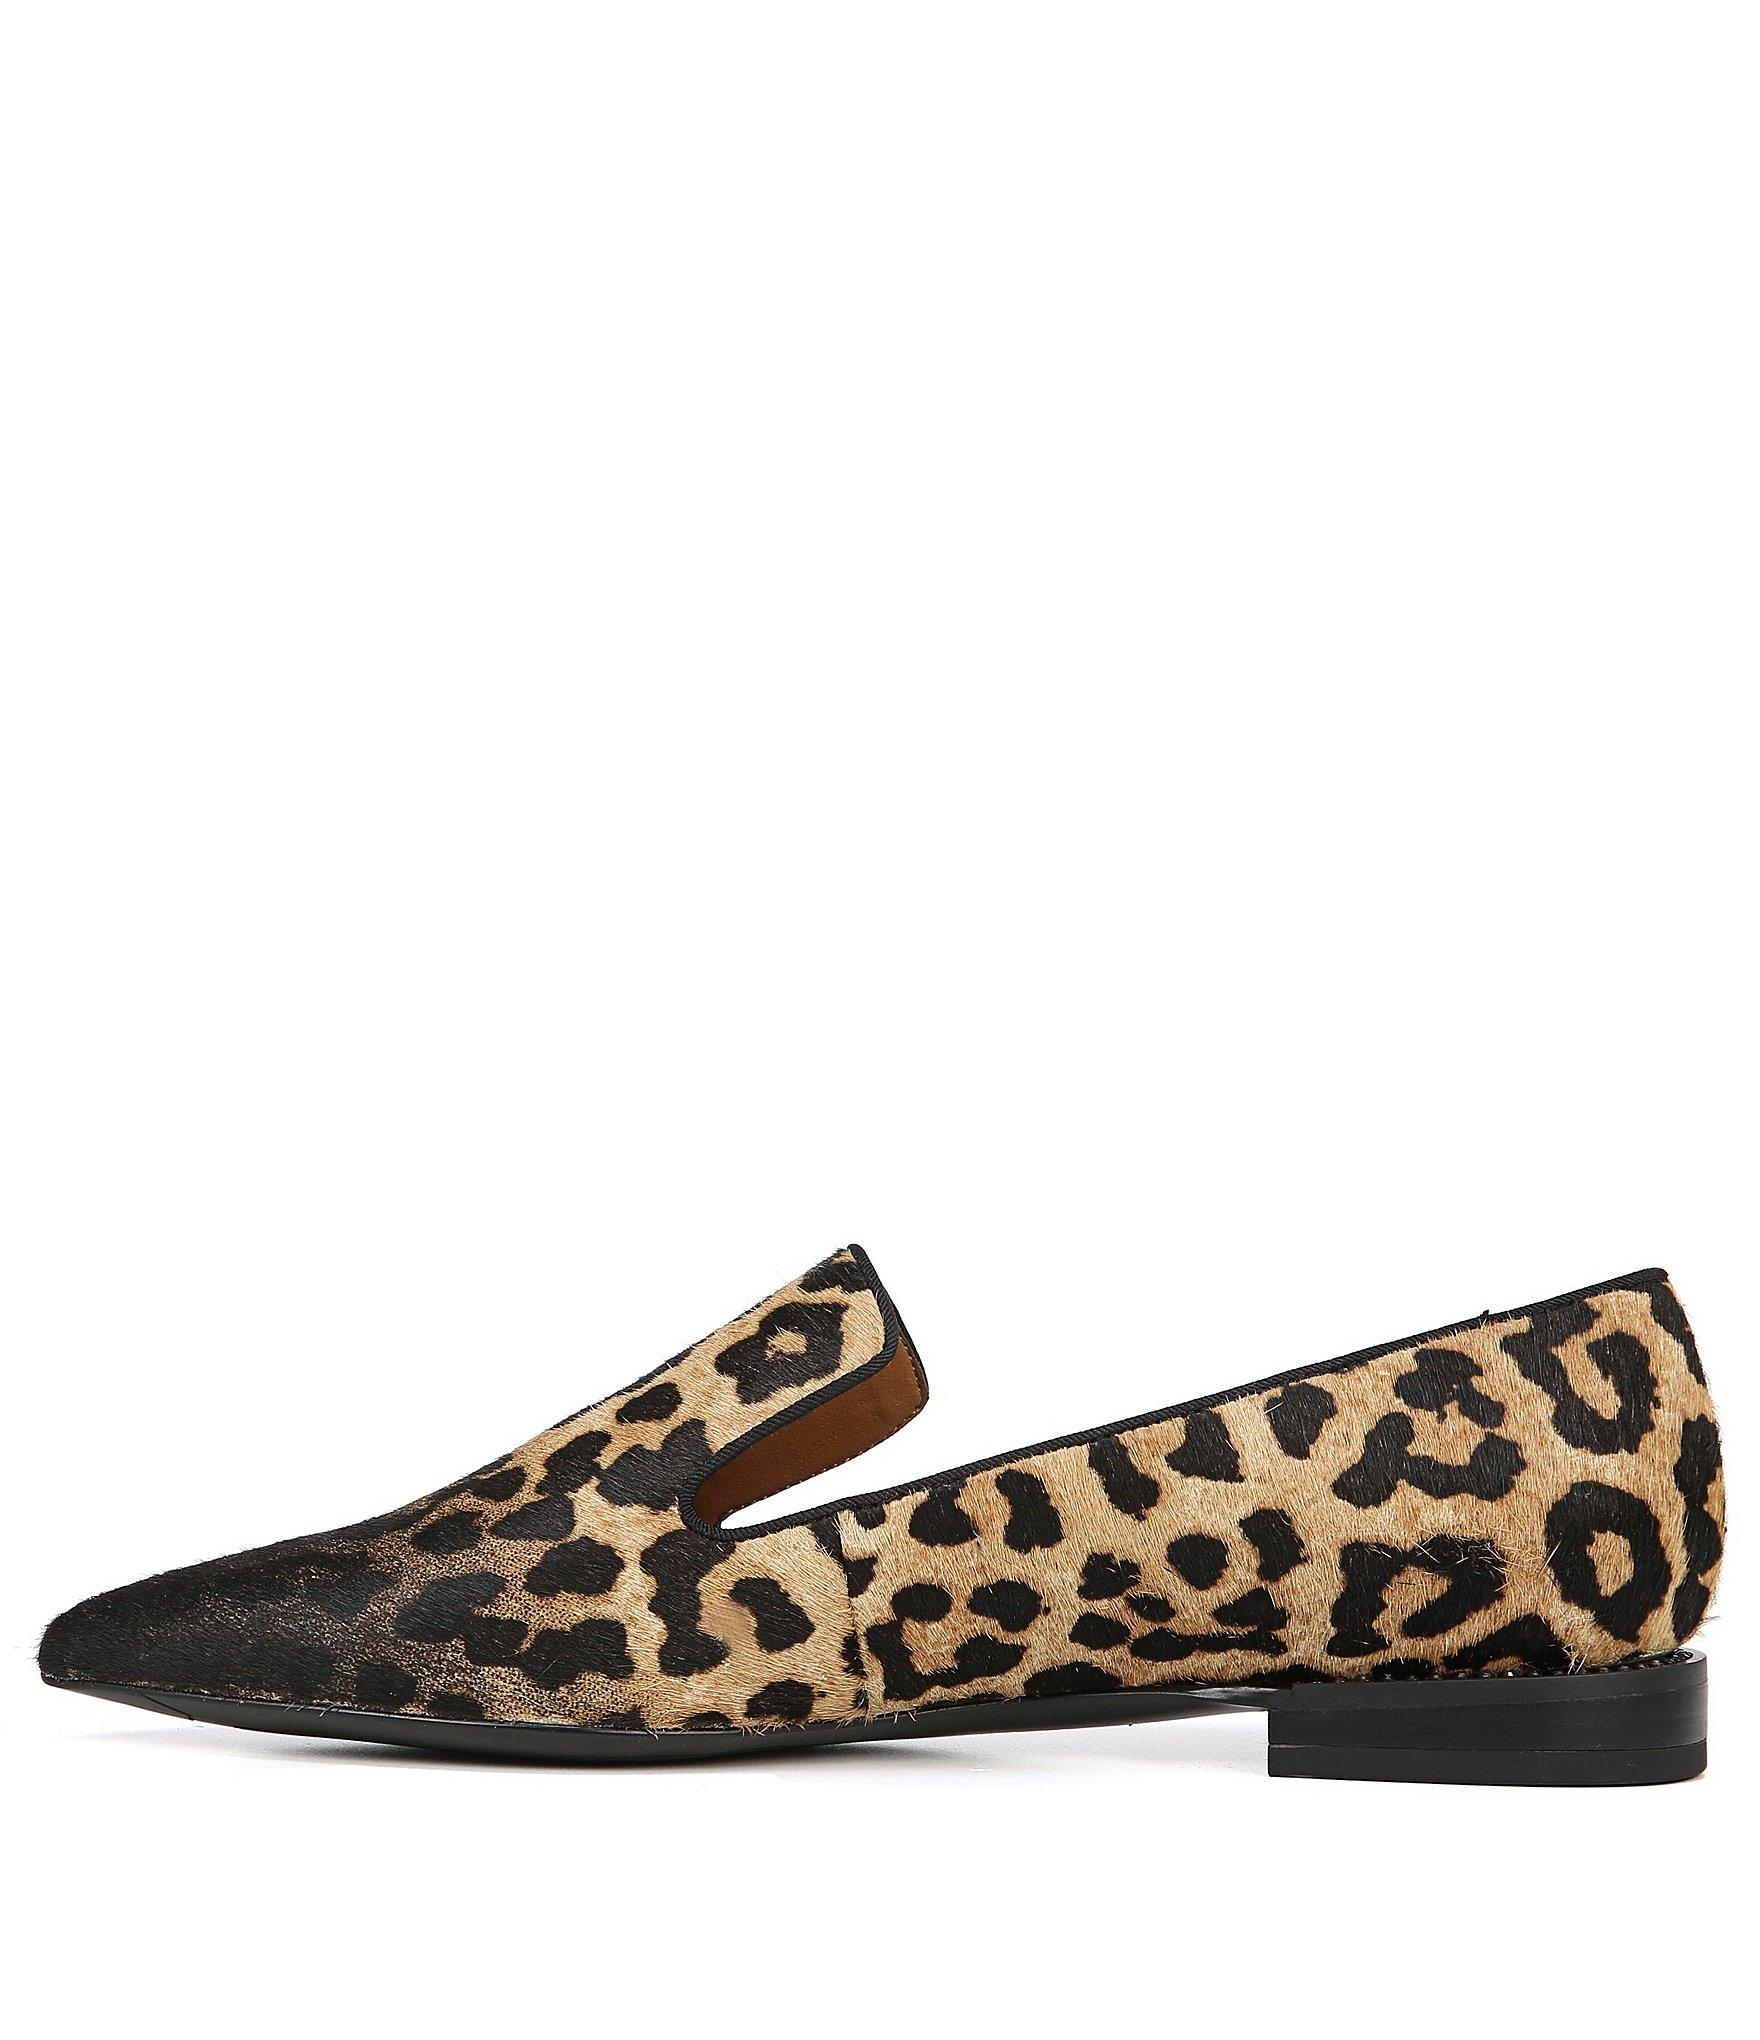 4f285f9f771 Lyst - Franco Sarto Sarto By Topaz 2 Leopard Print Calf Hair Loafers